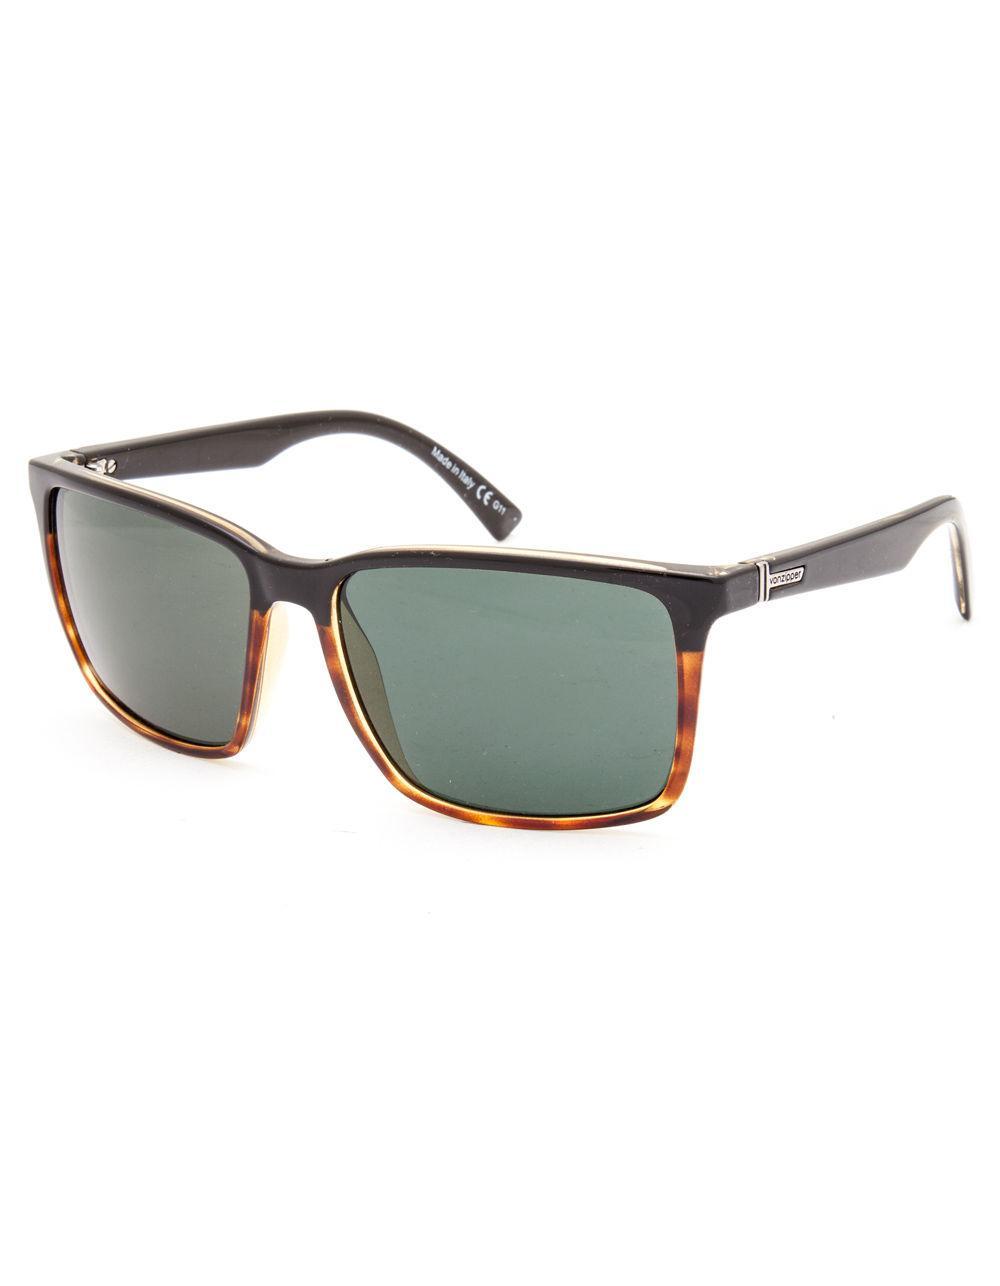 d4226f2712 Lyst - Von Zipper Lesmore Hardline Sunglasses for Men